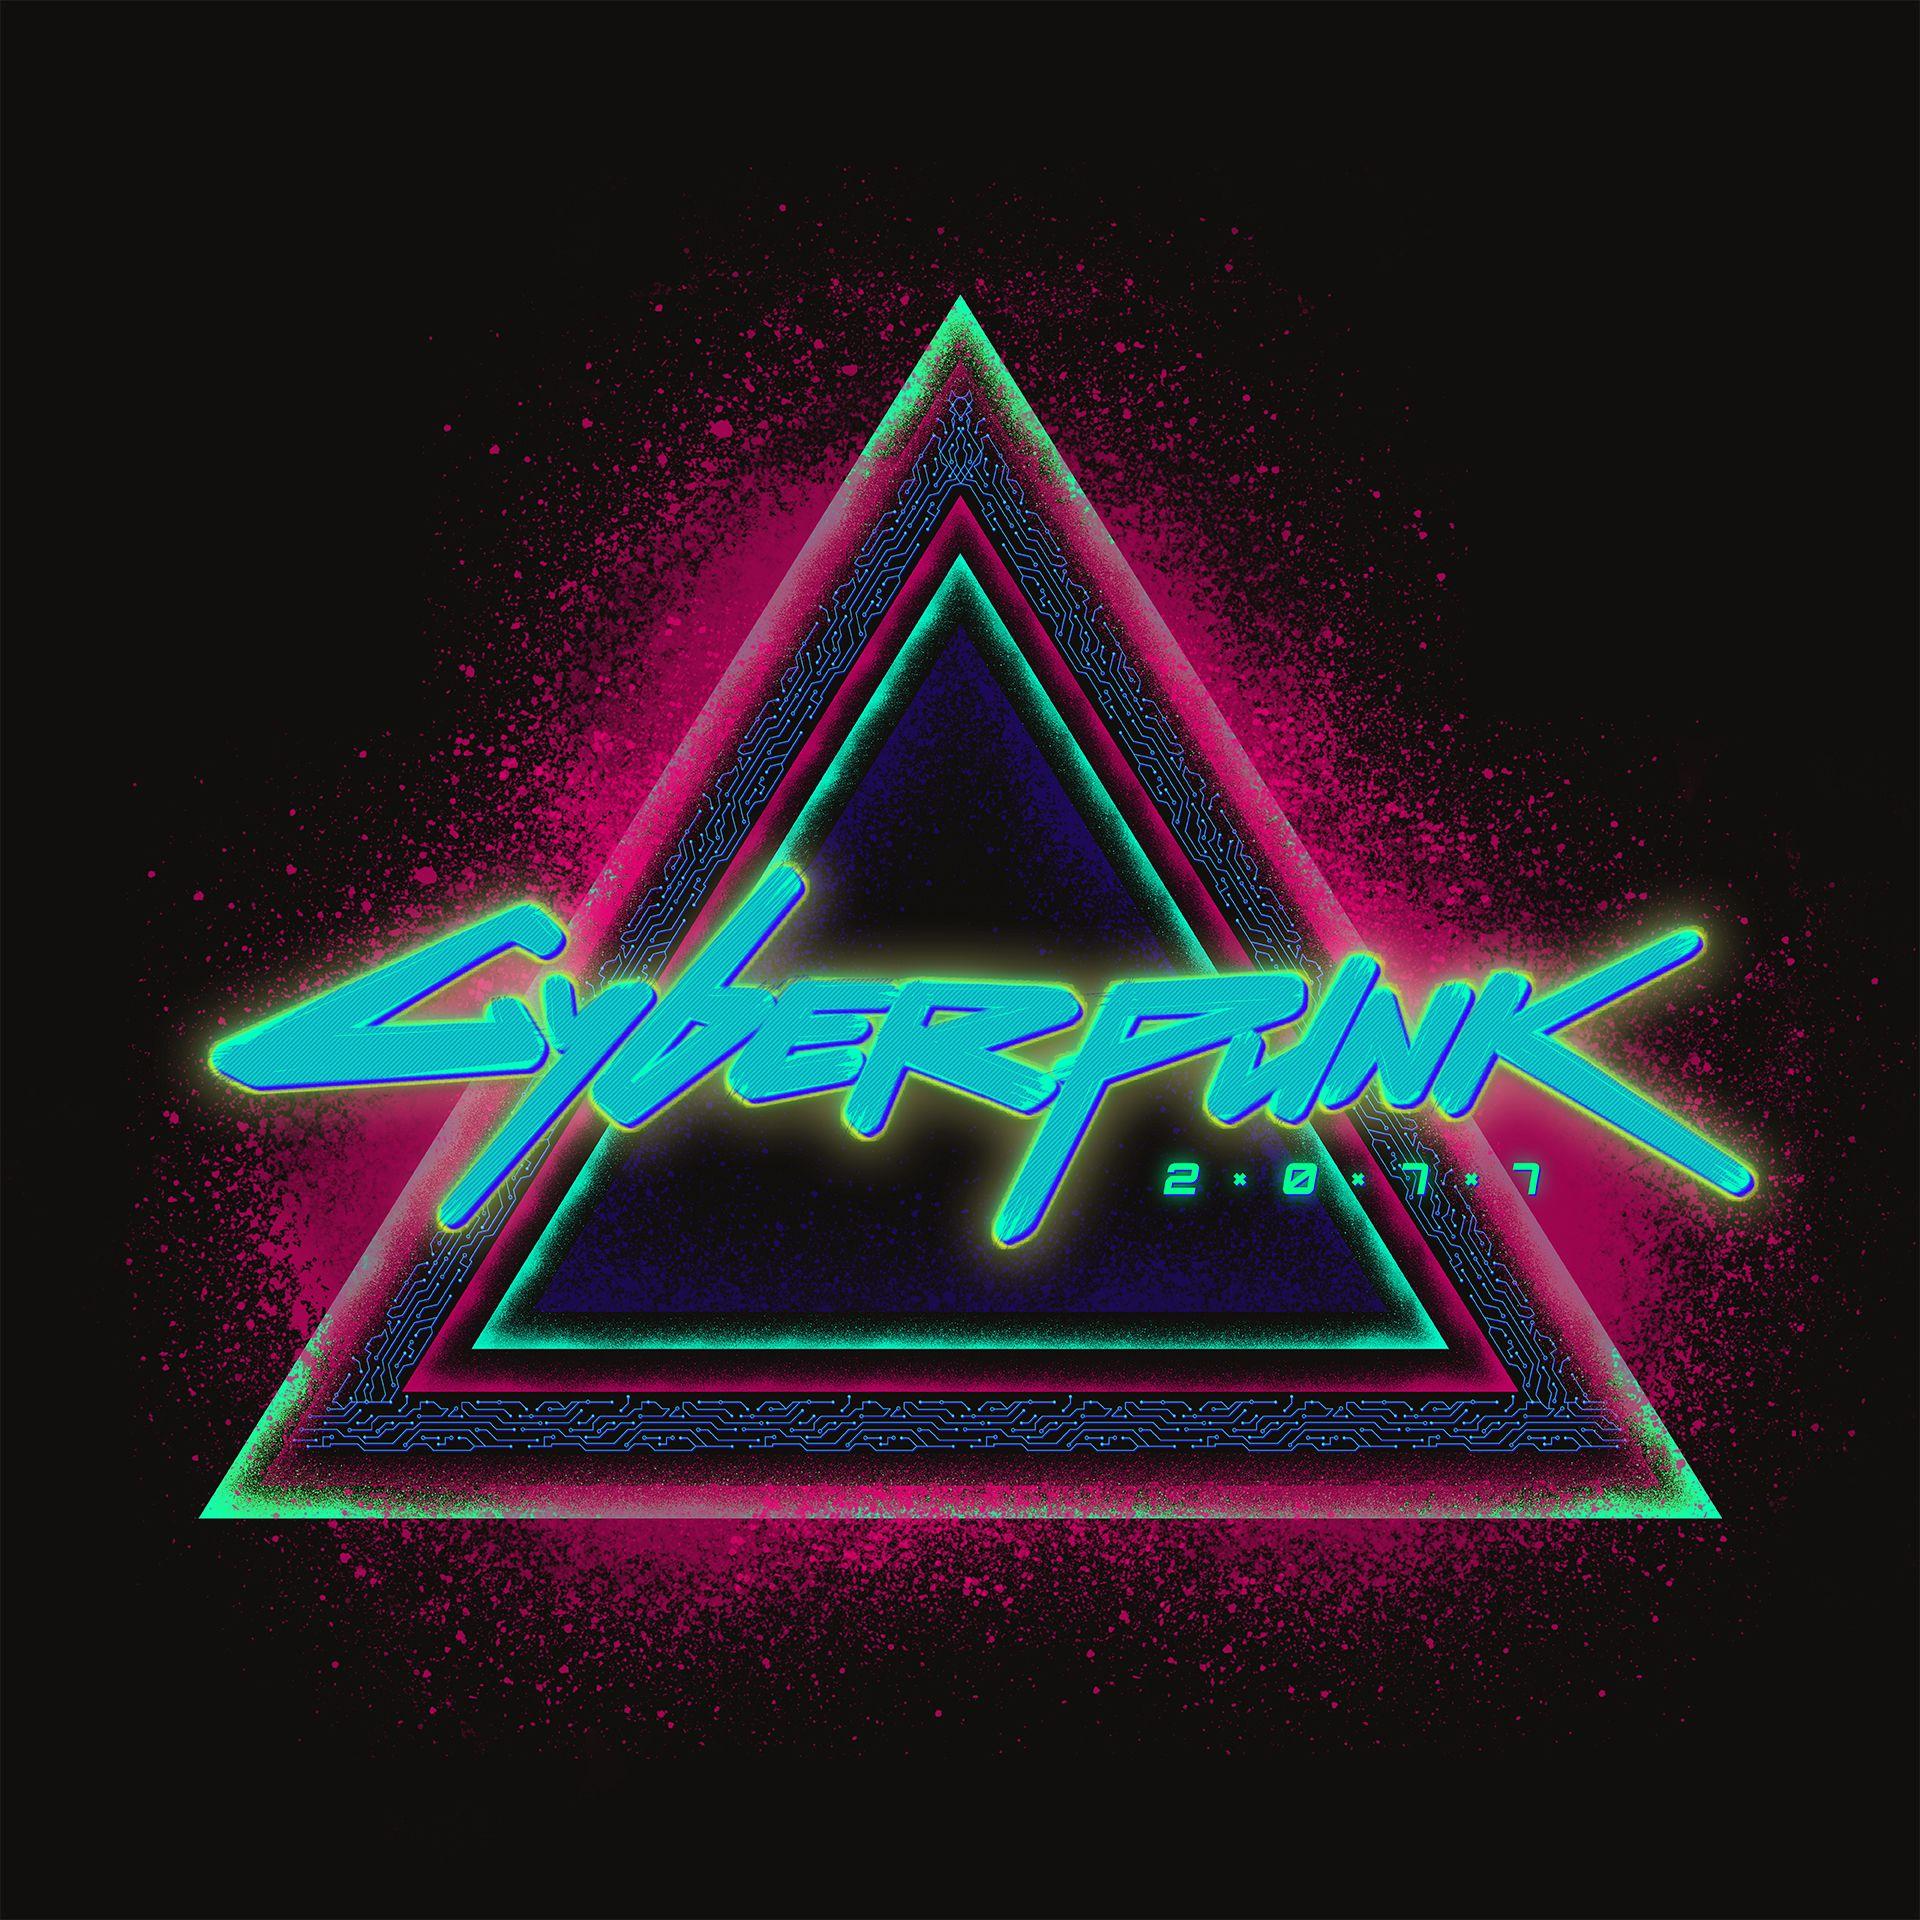 Cyberpunk 2077 | Cyberpunk 2077, Cyberpunk, Cyberpunk 2020